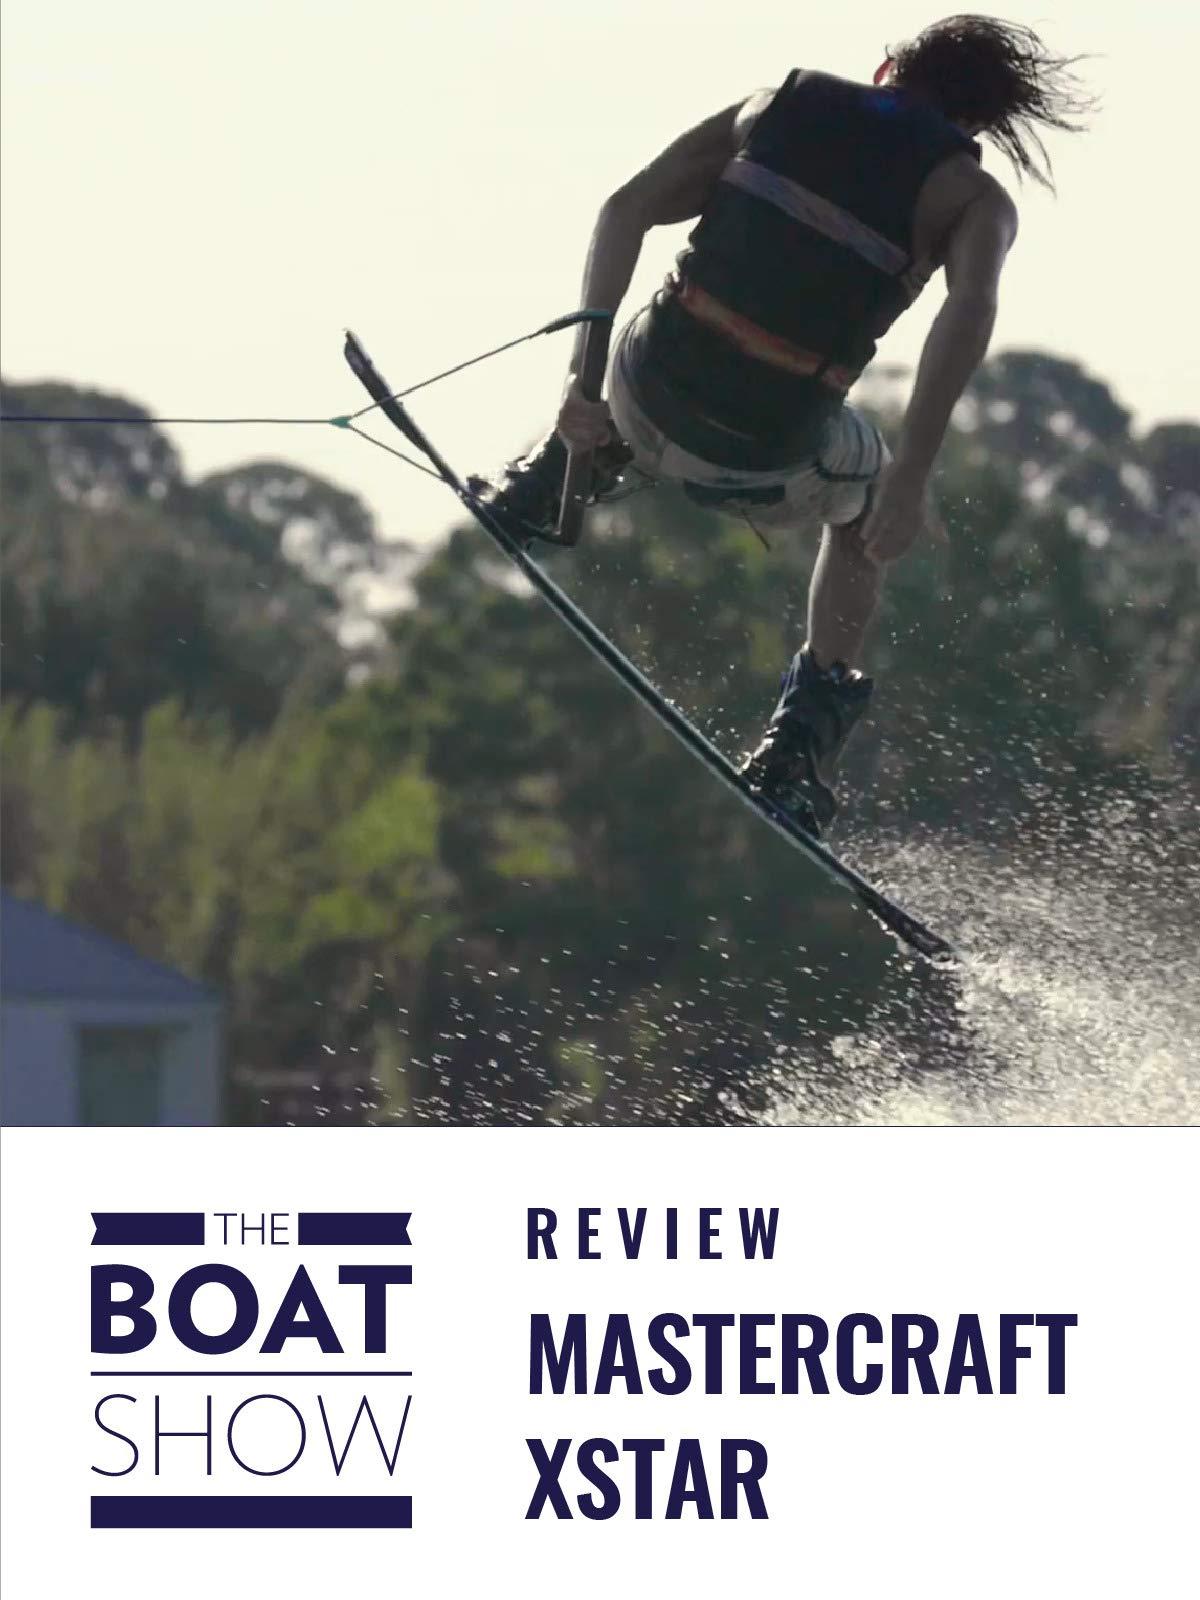 Clip: Mastercraft Xstar - The Boat Show